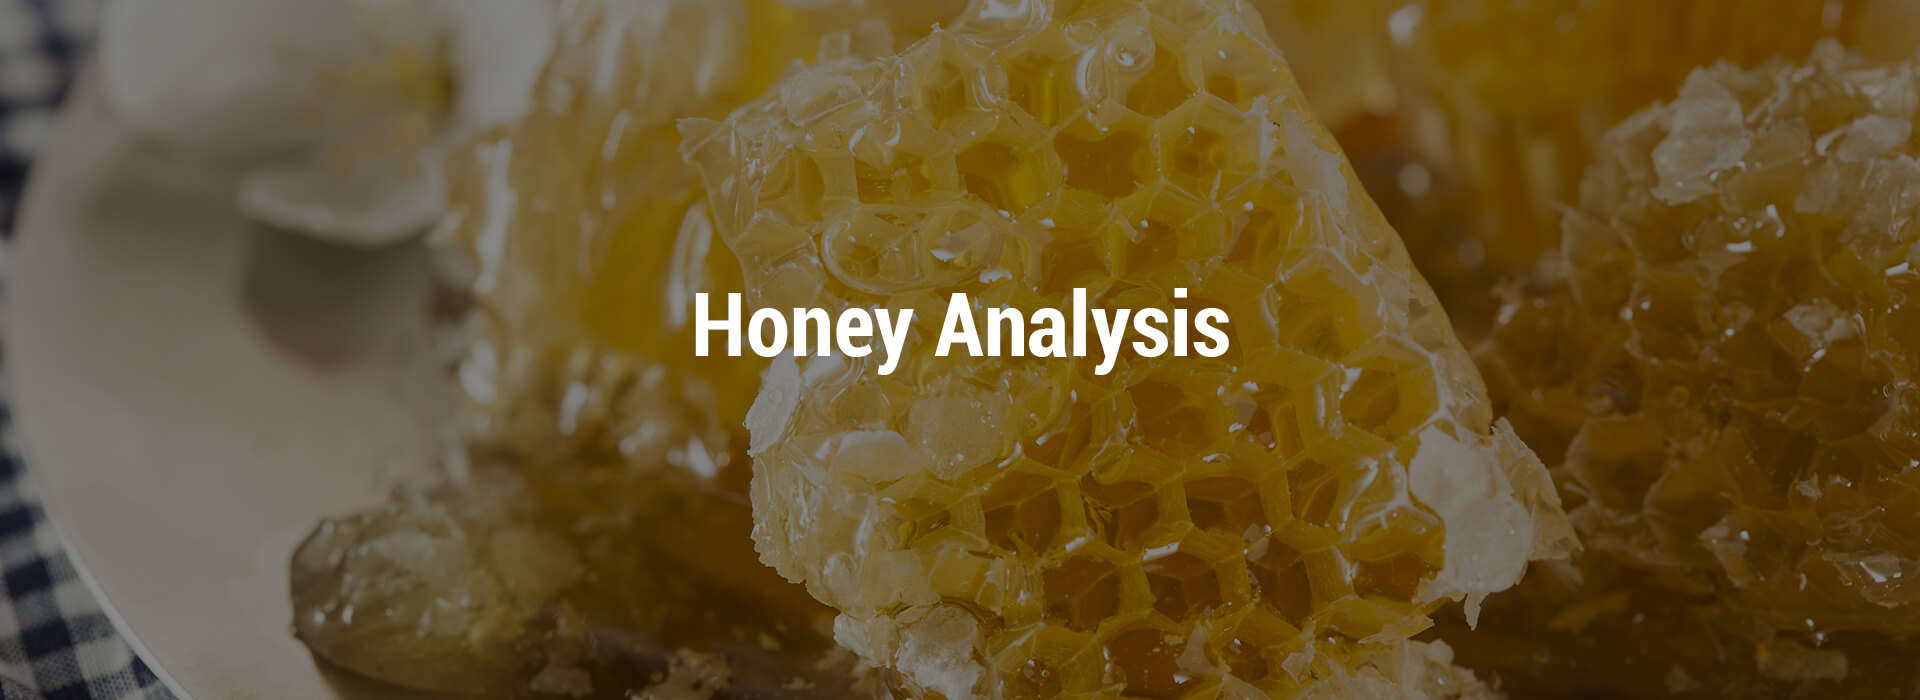 LVHS-honey-header